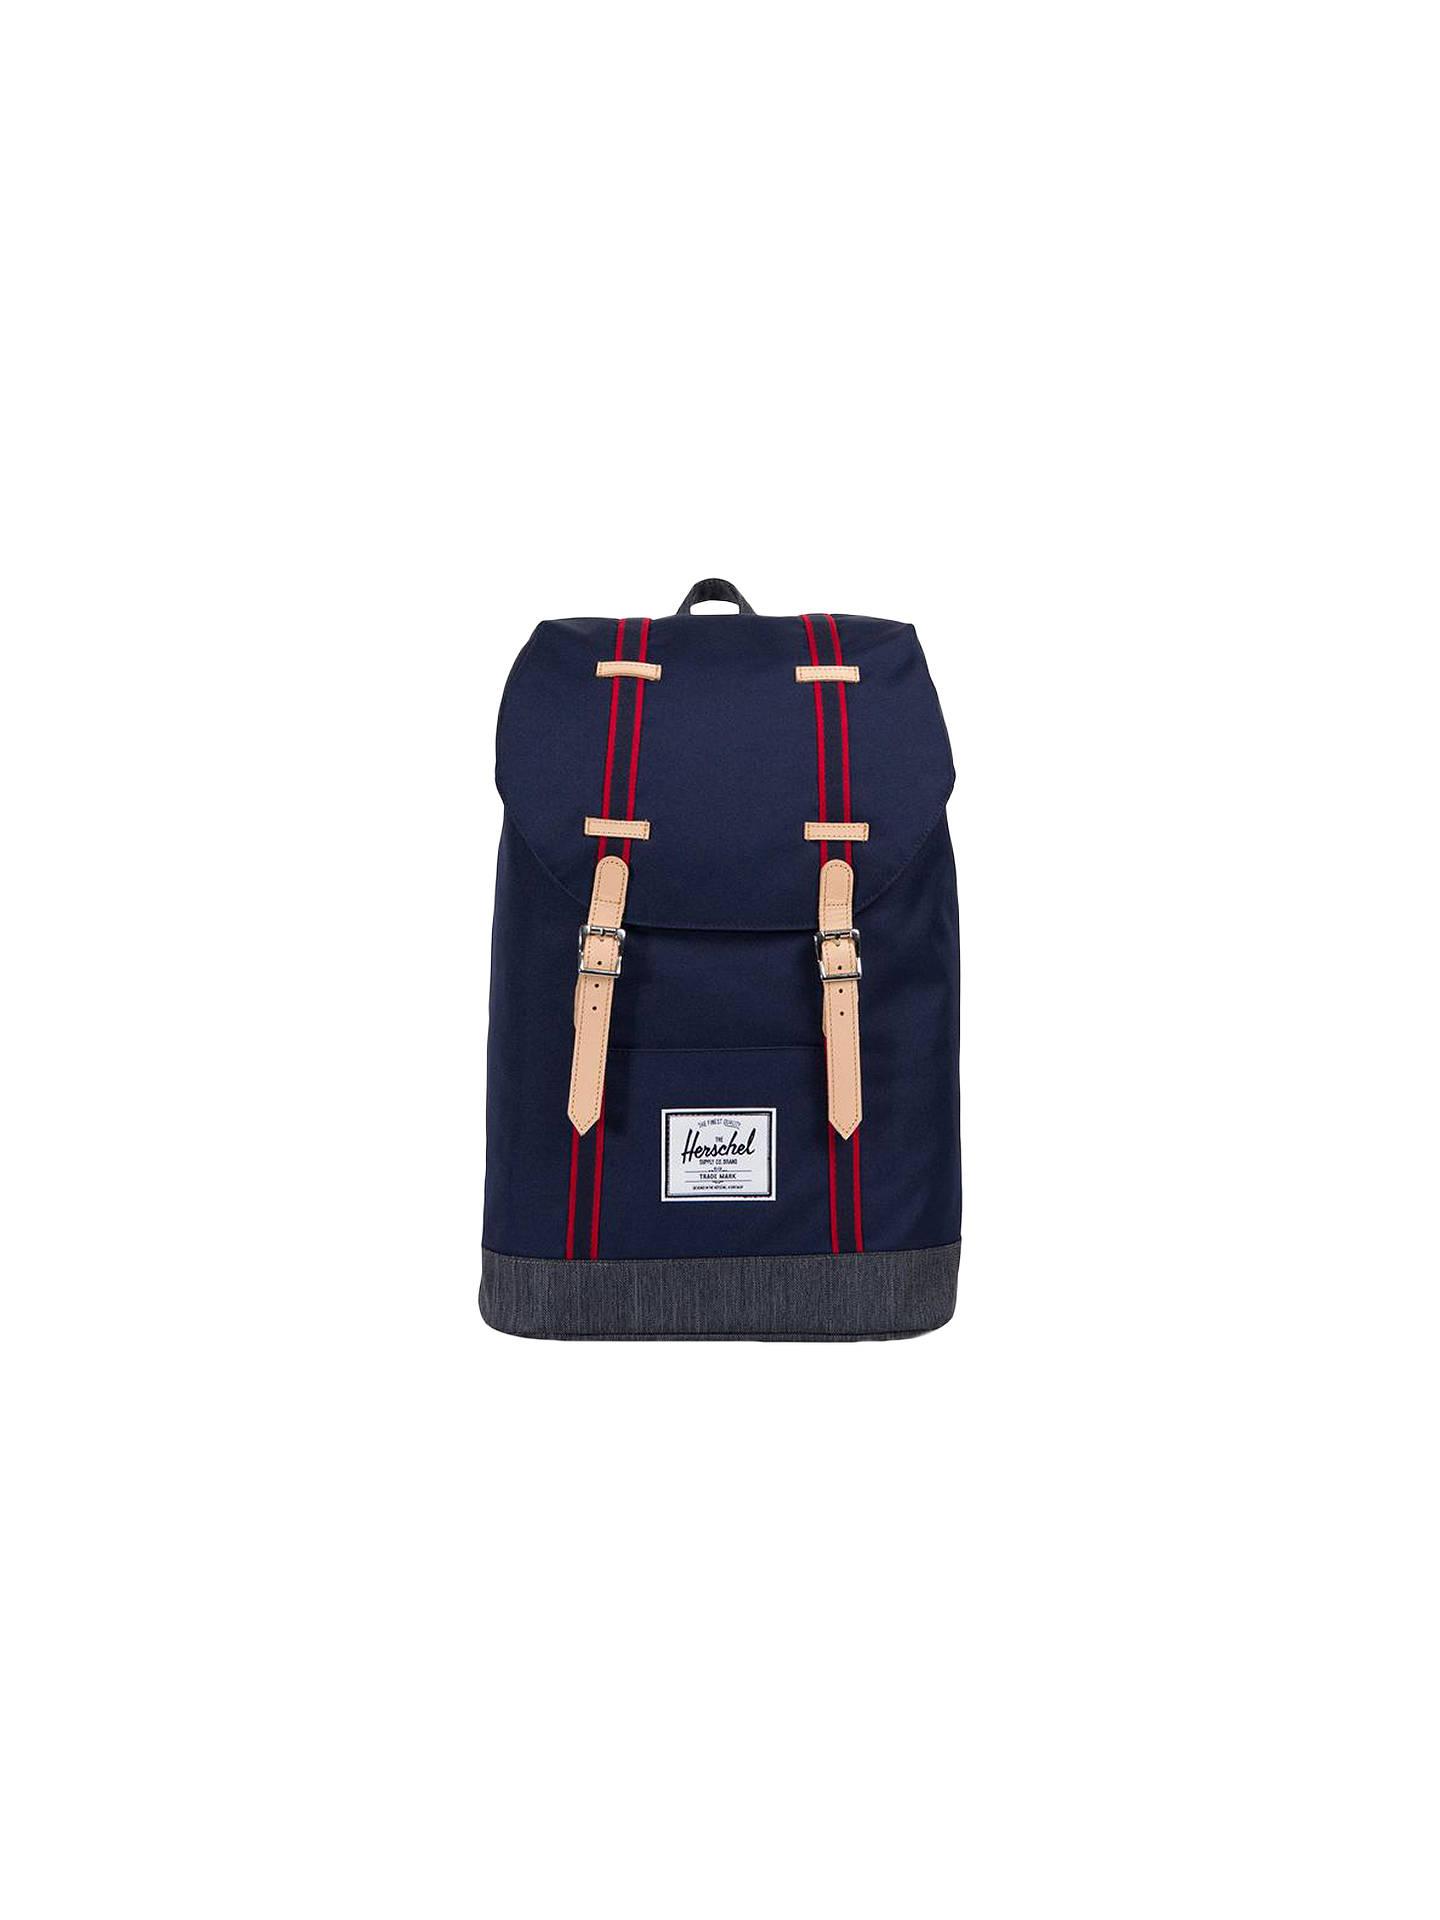 f10531d13 Buy Herschel Supply Co. Retreat Backpack, Blue/Denim Online at  johnlewis.com ...